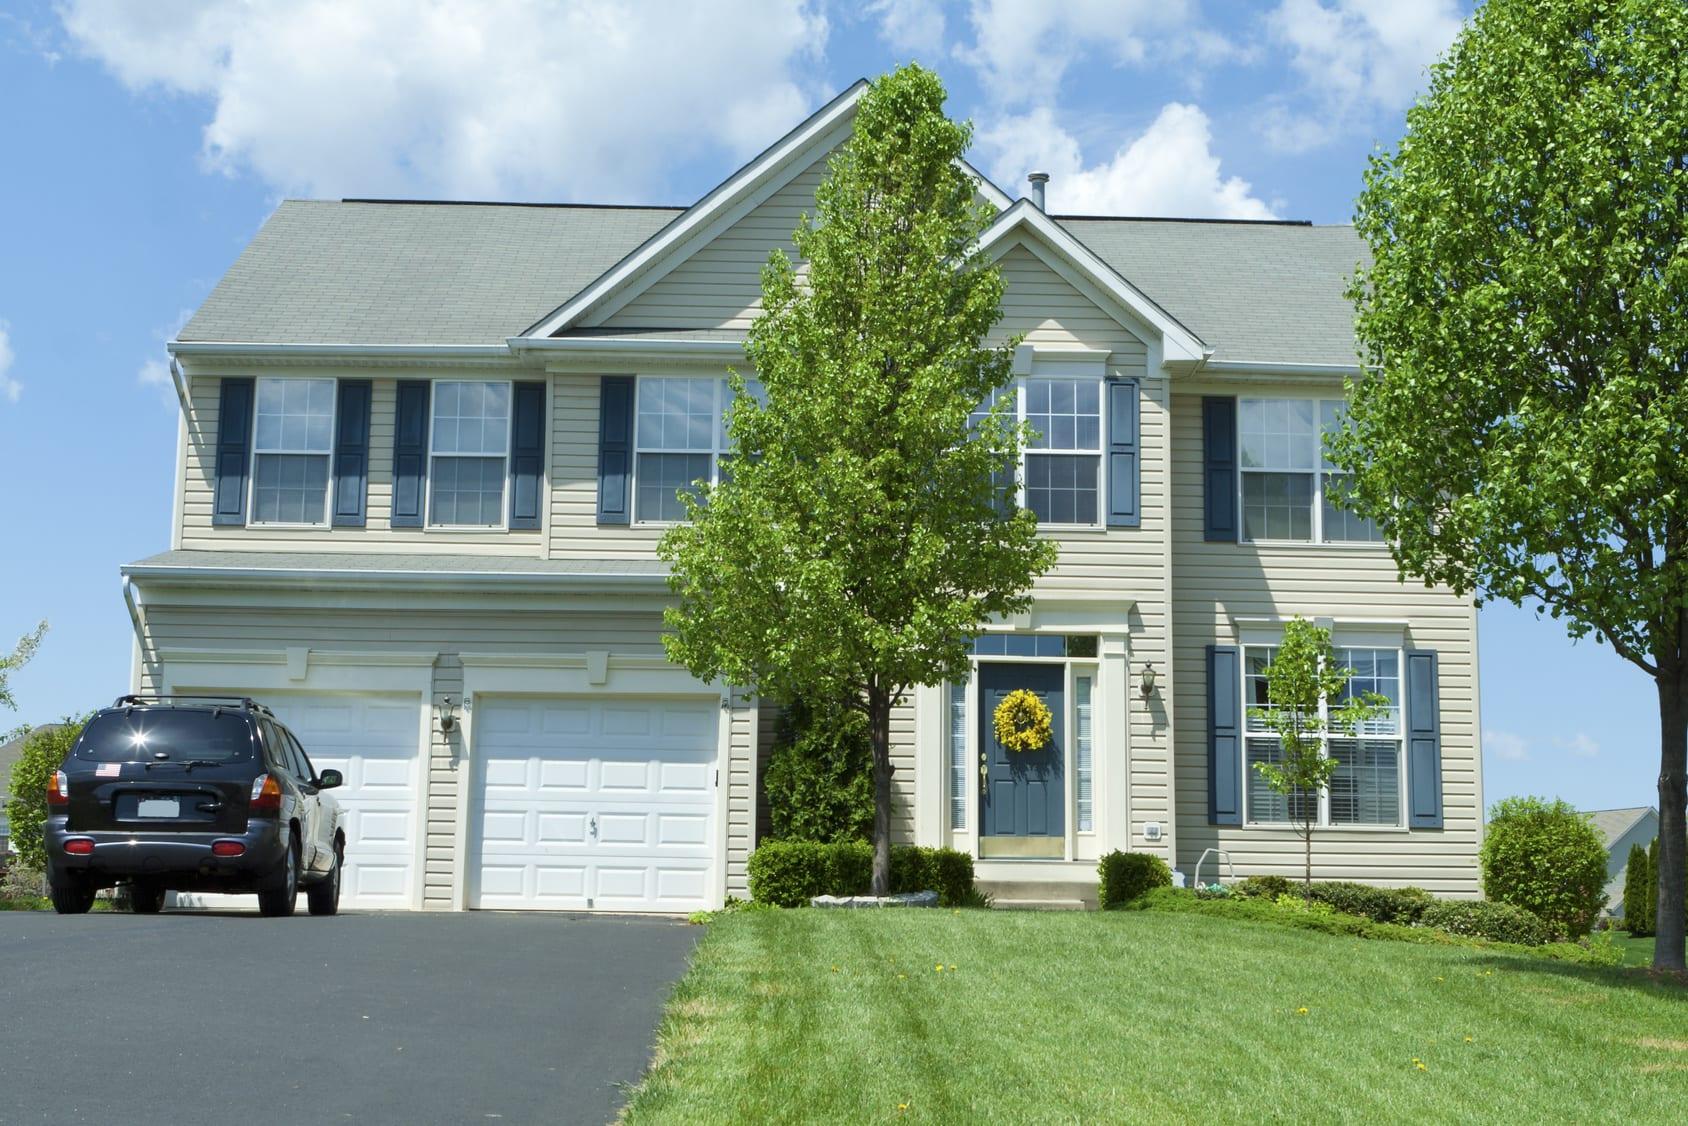 Home and Auto Insurance Bundle